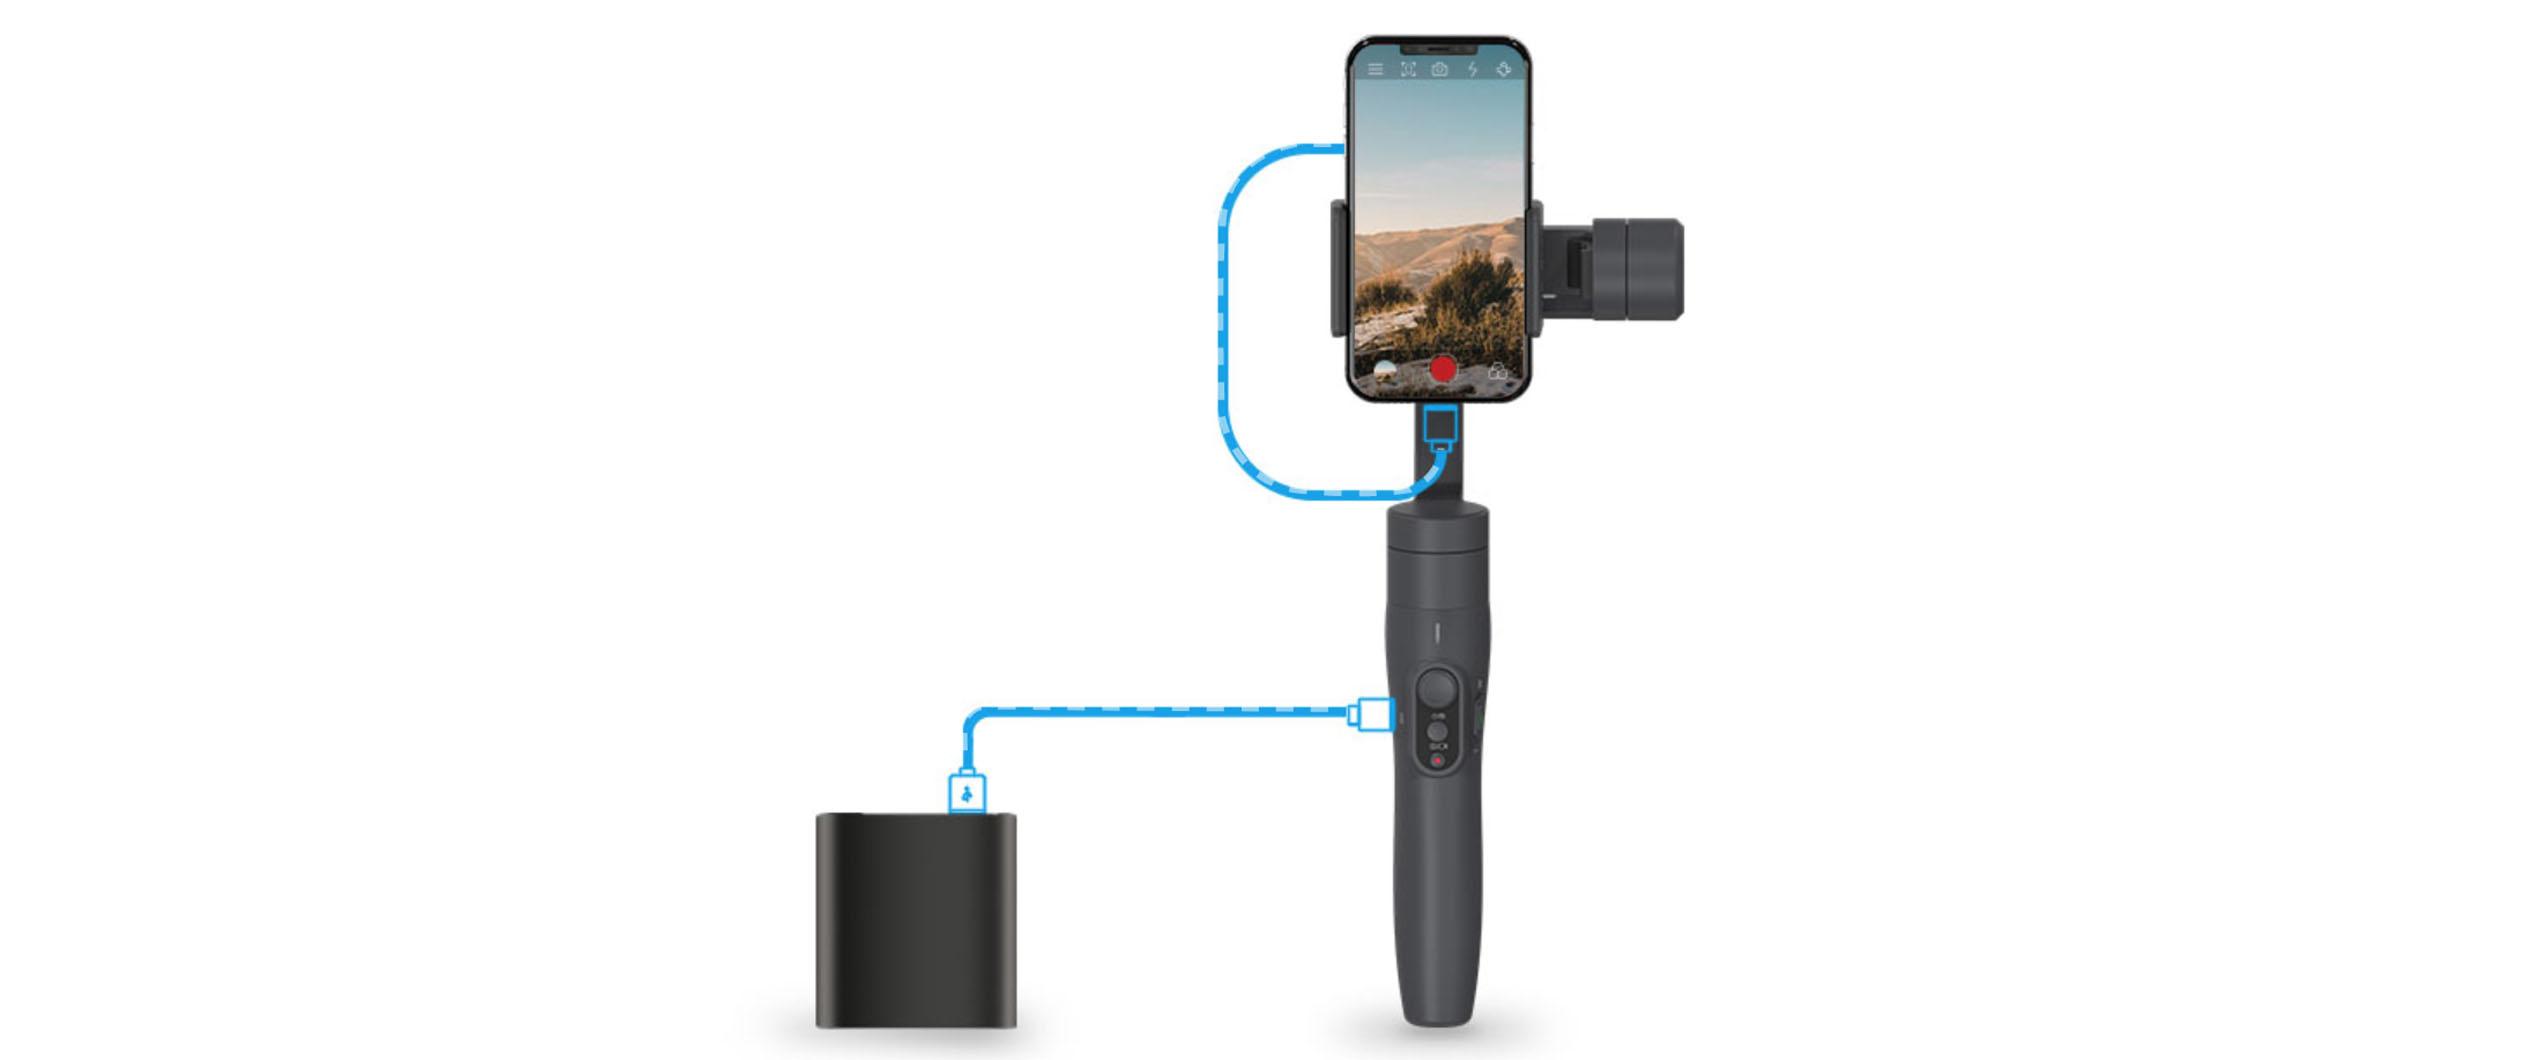 FeiyuTech Vimble 2 Gimbal Stabilizer & Pole